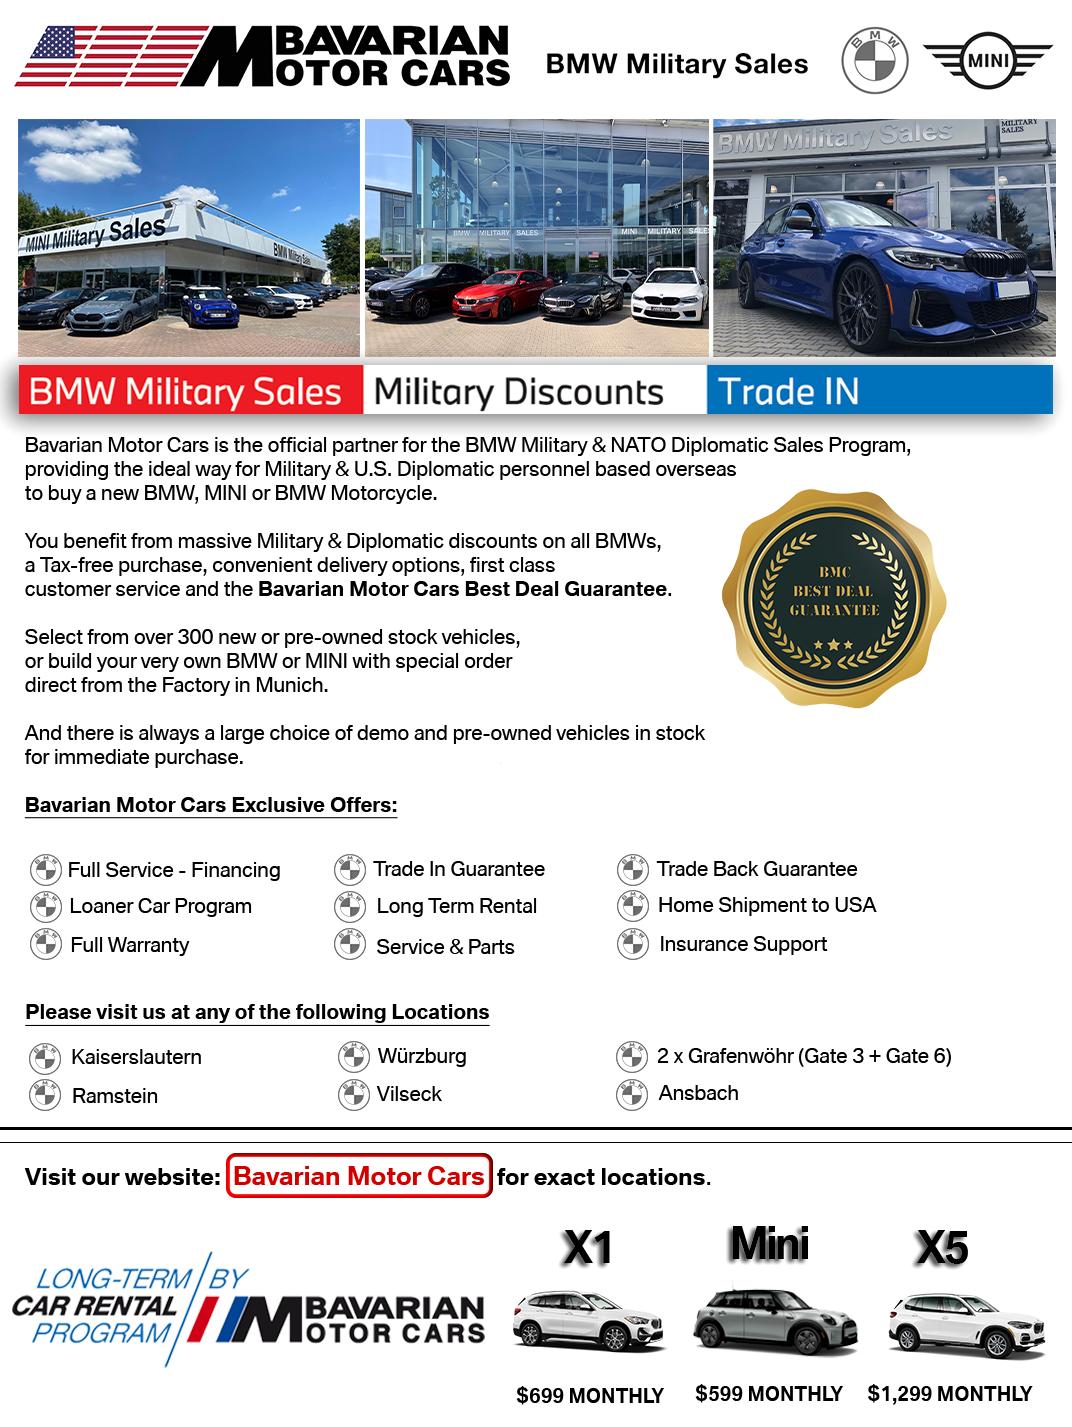 Bavarian Motor Cars BMW Military Sales MINI Military Sales